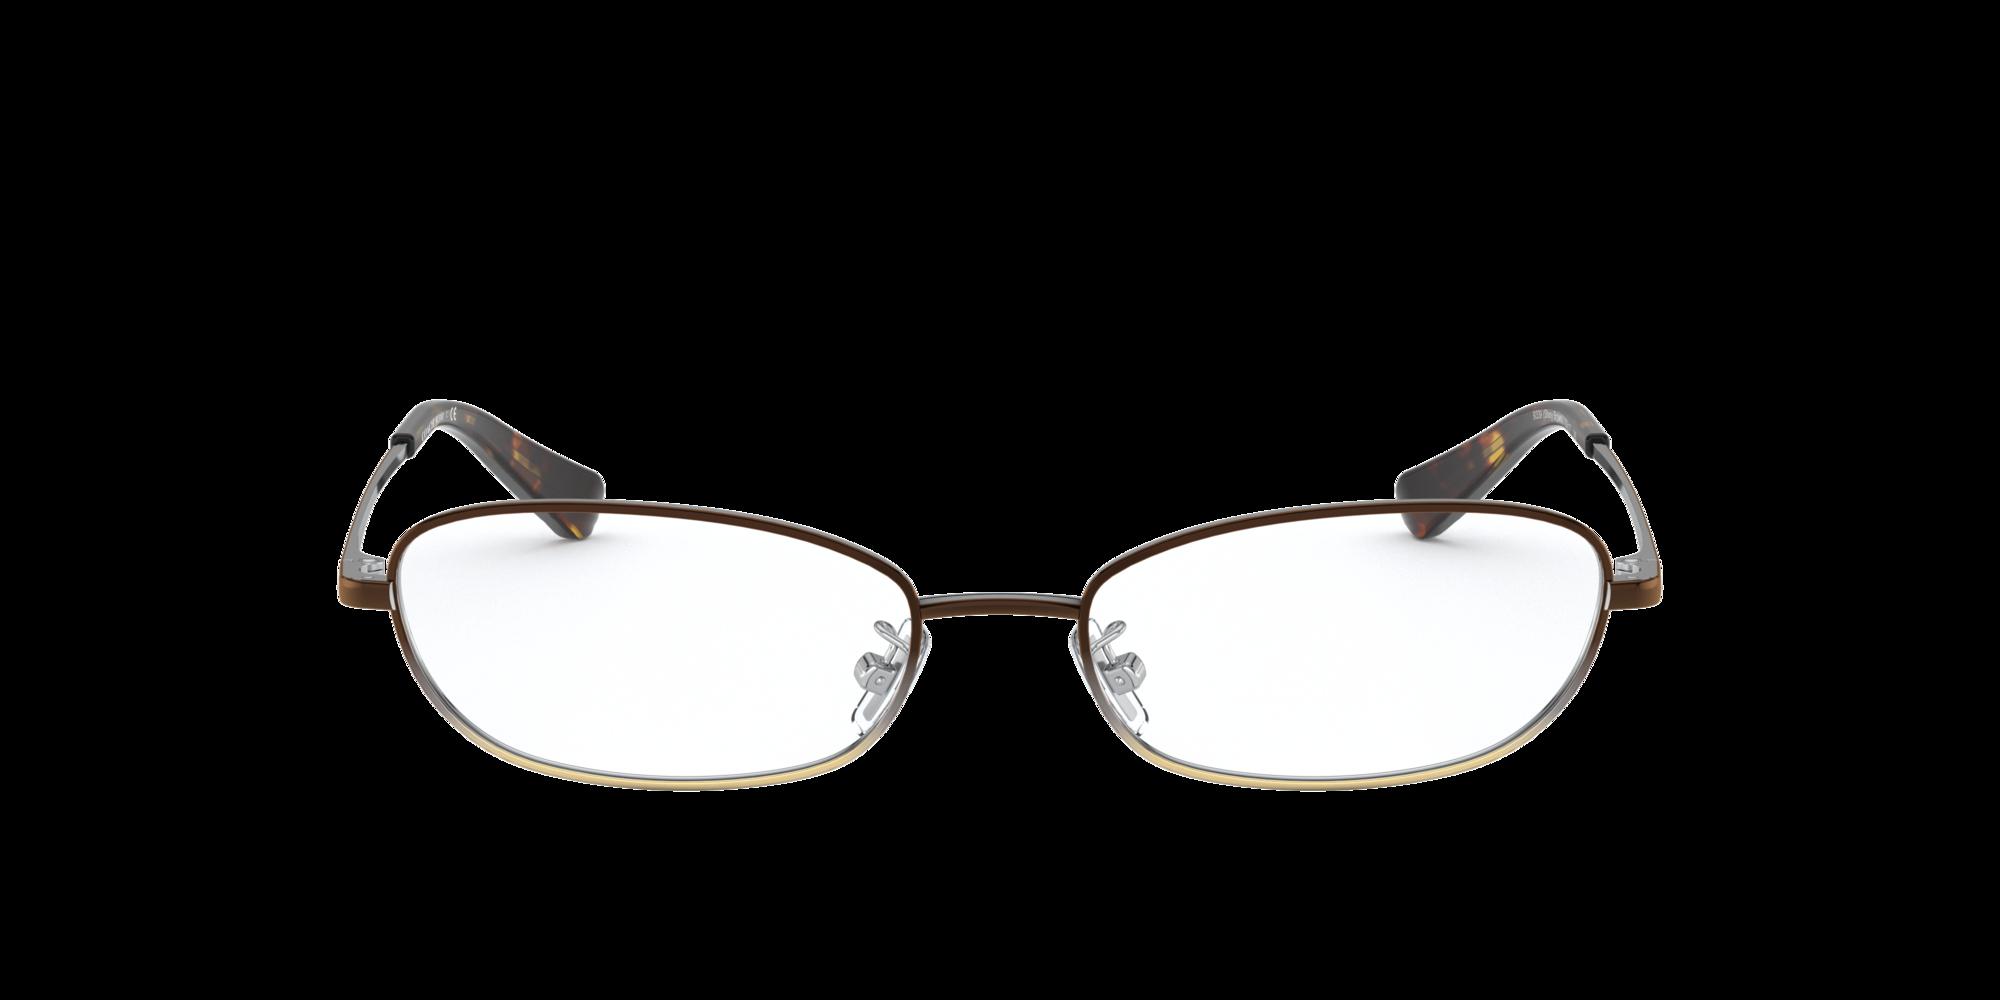 Image for HC5107 from LensCrafters | Glasses, Prescription Glasses Online, Eyewear